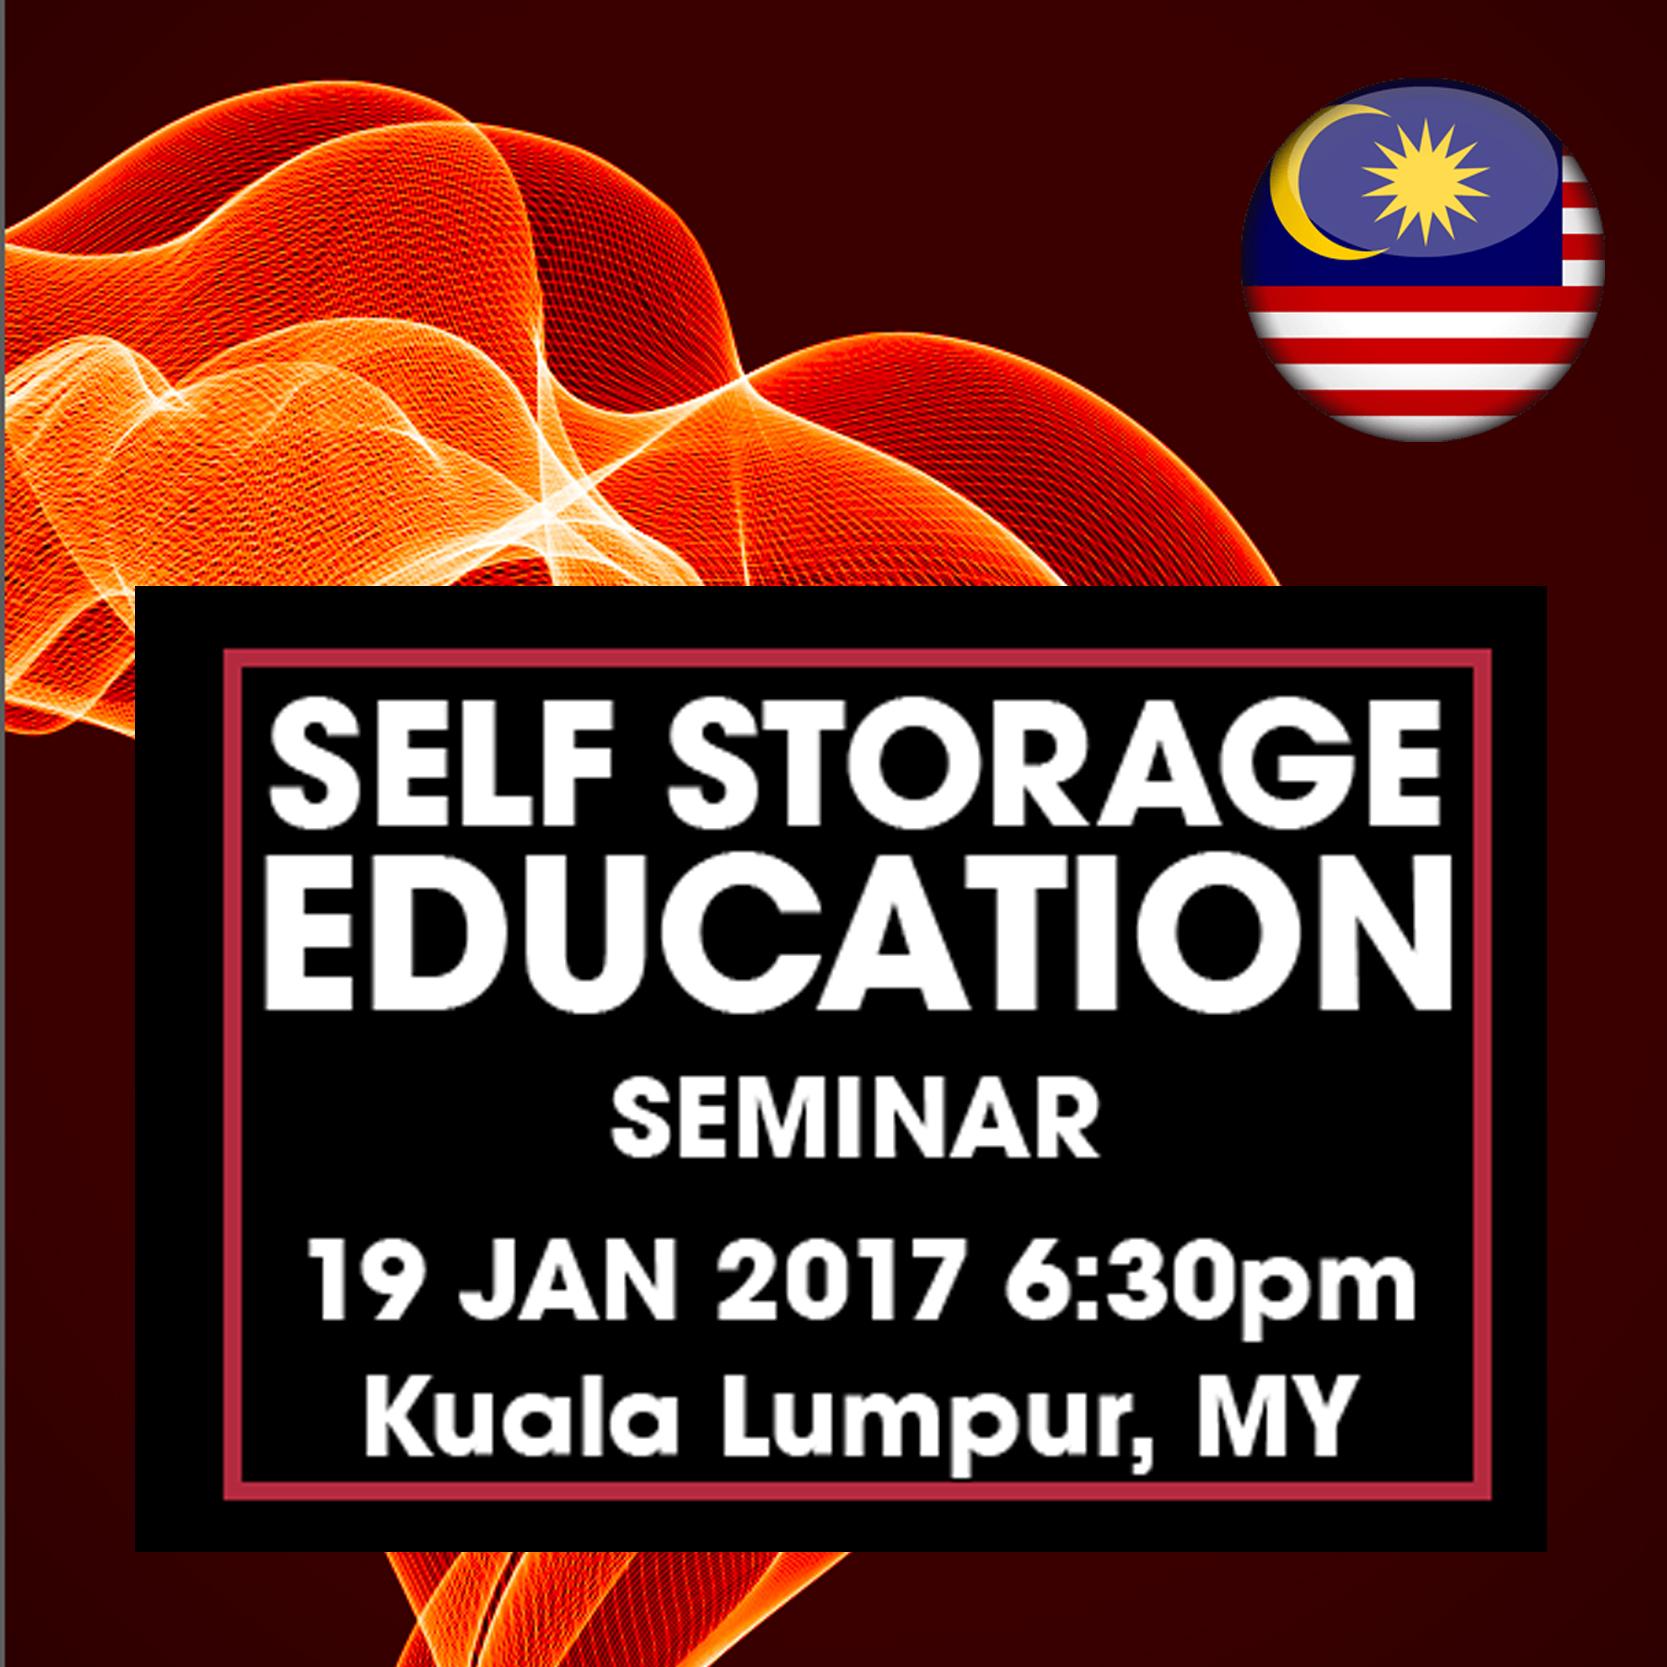 Jan 19 - Malaysia Fire Safety Education Seminar